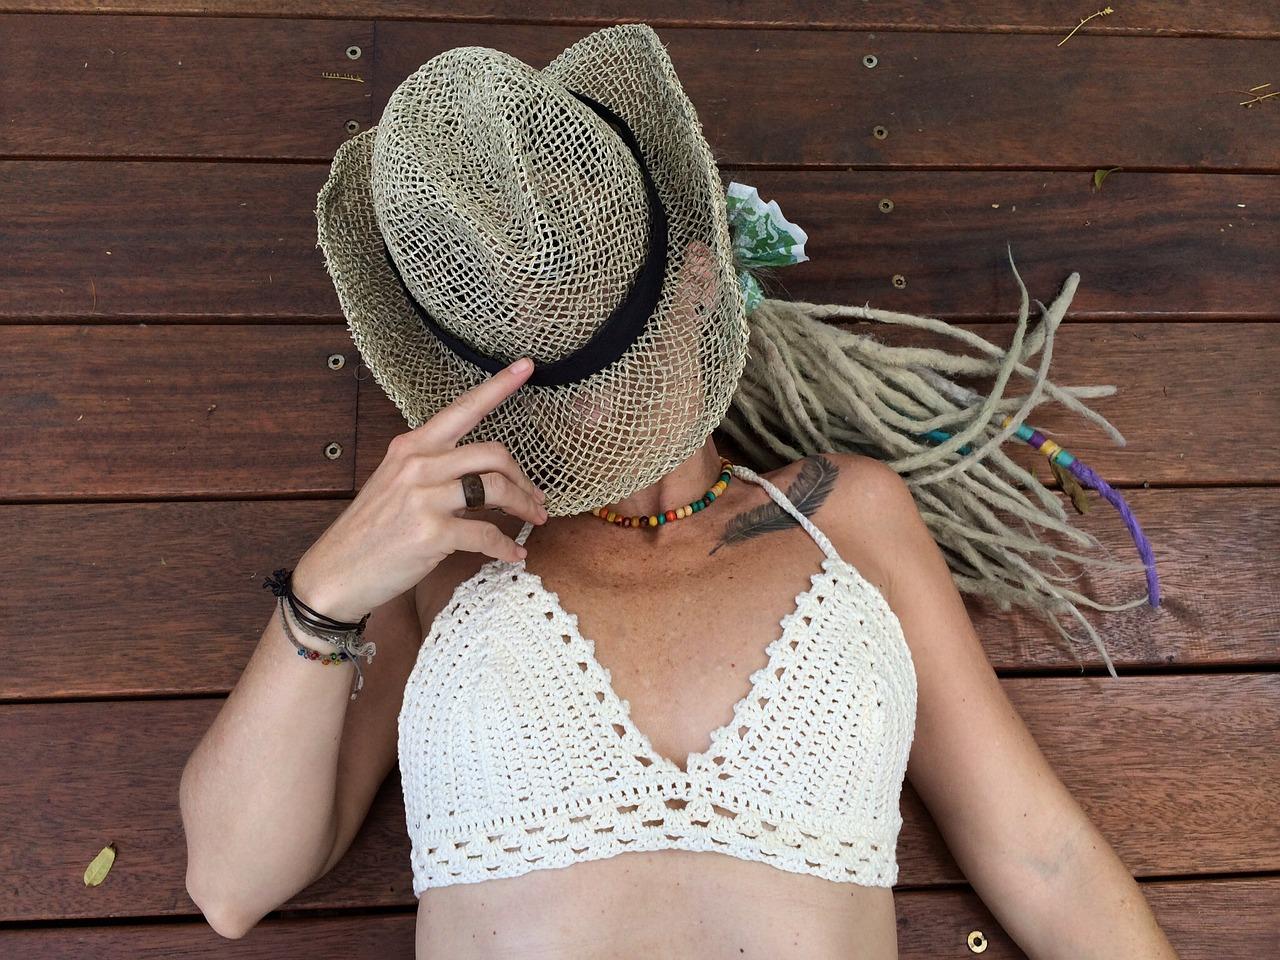 dreadlocks hoed bikini